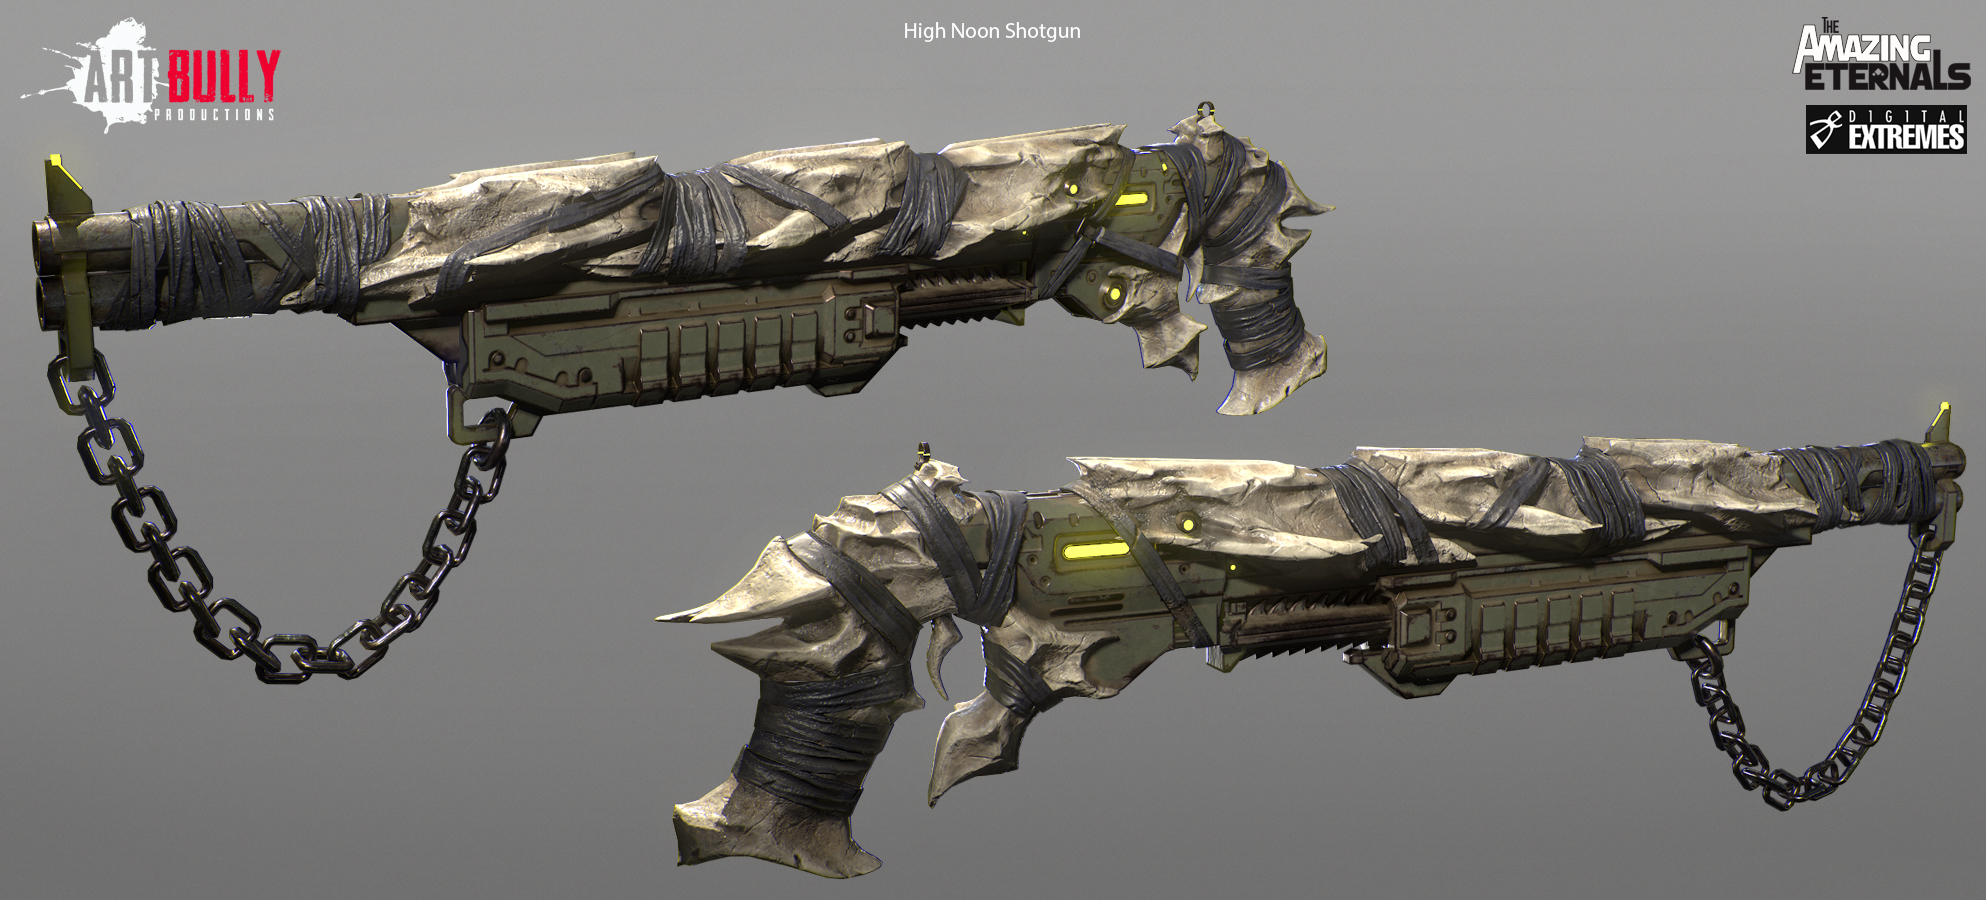 HighNoon_Shotgun_Render.jpg